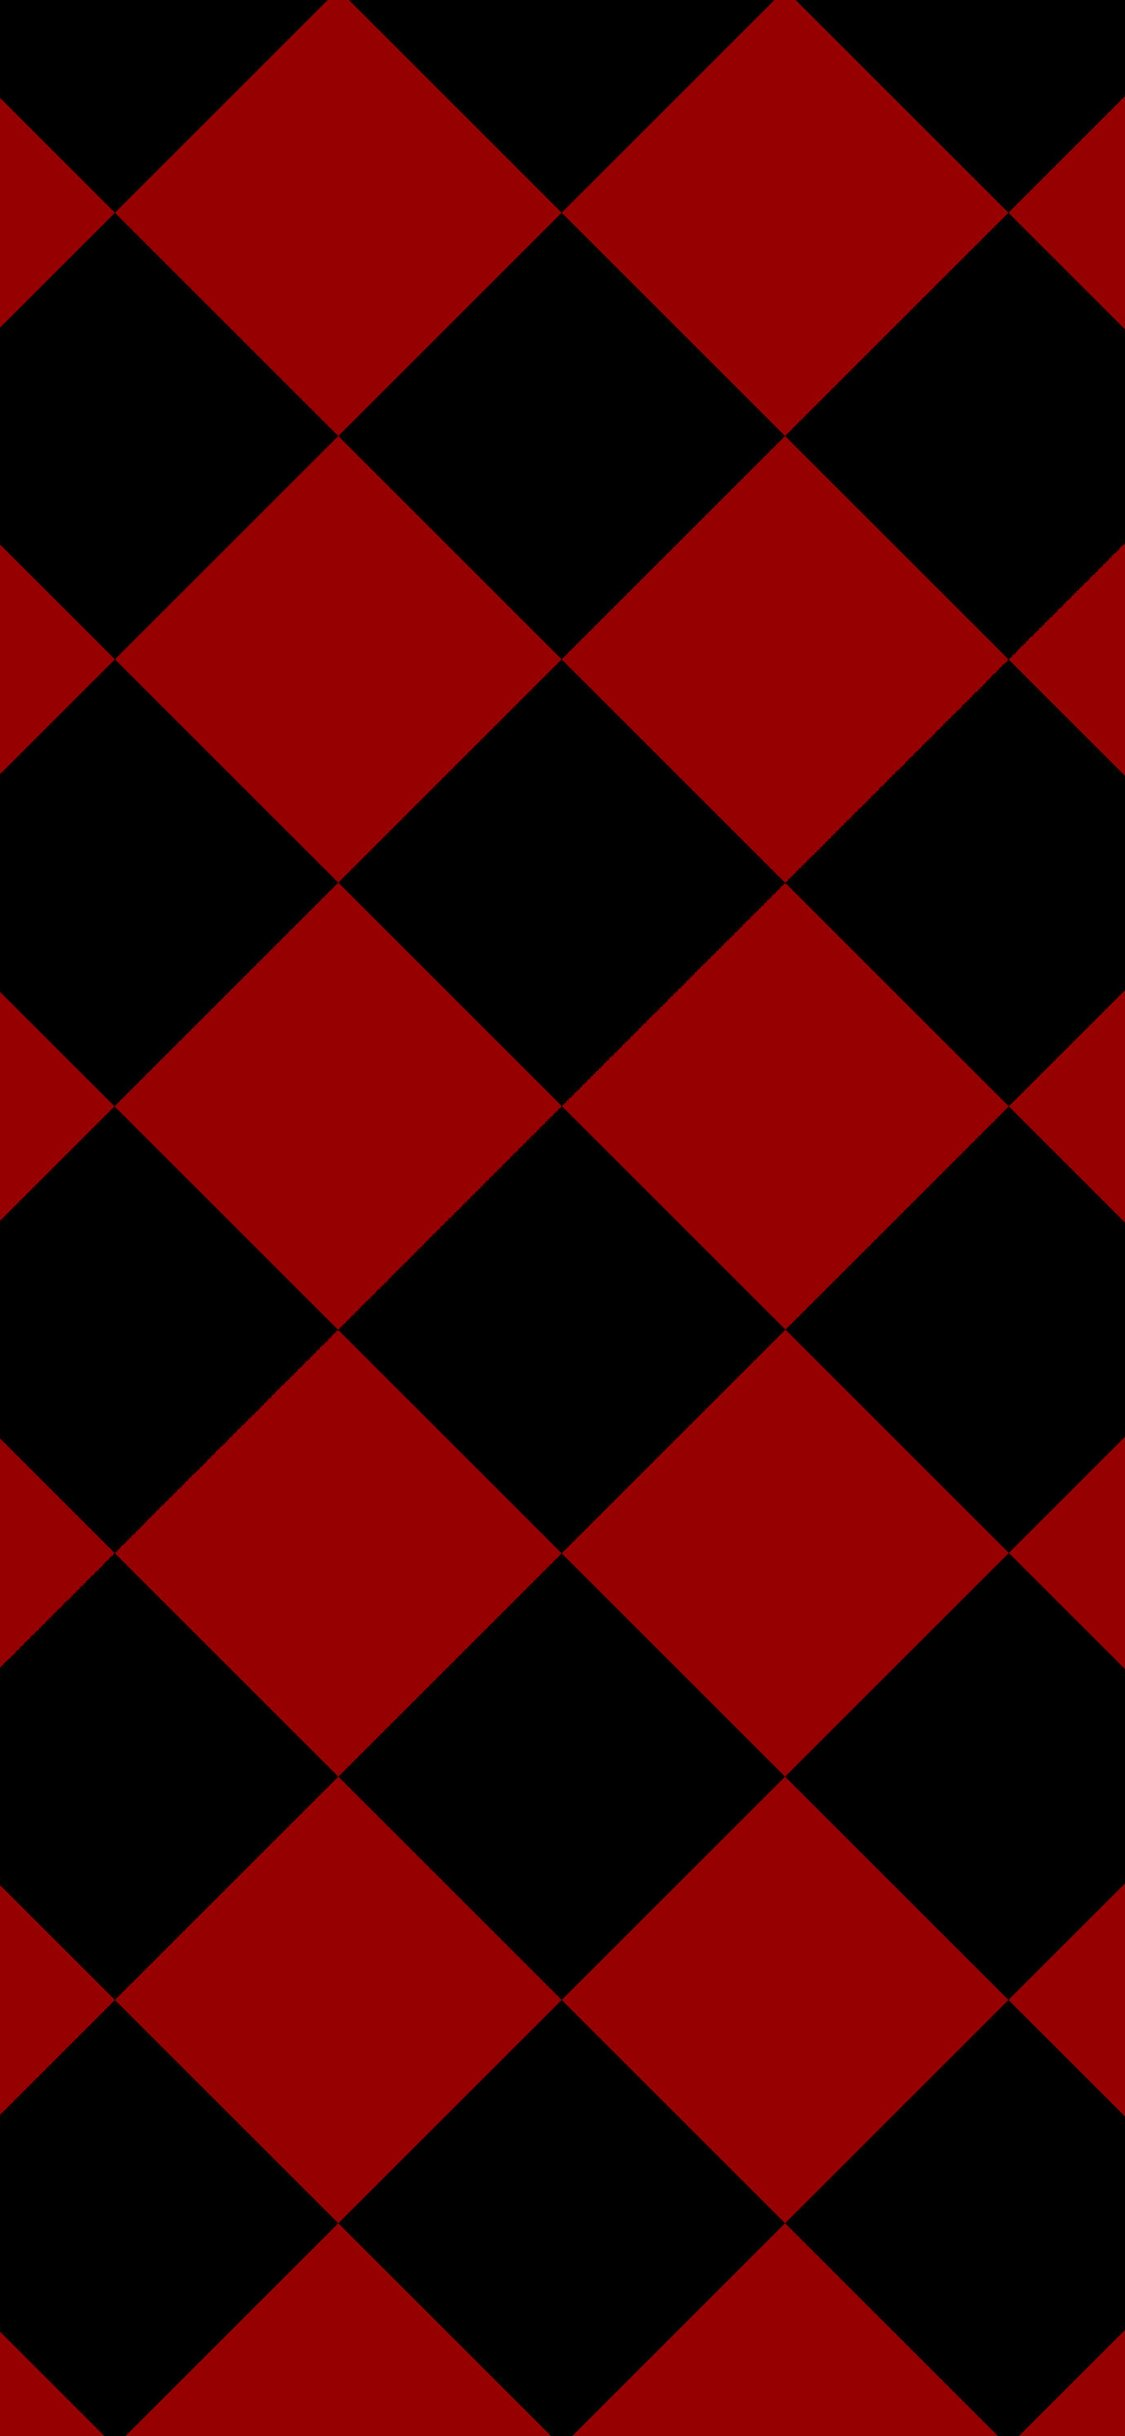 Wallpaper 772557